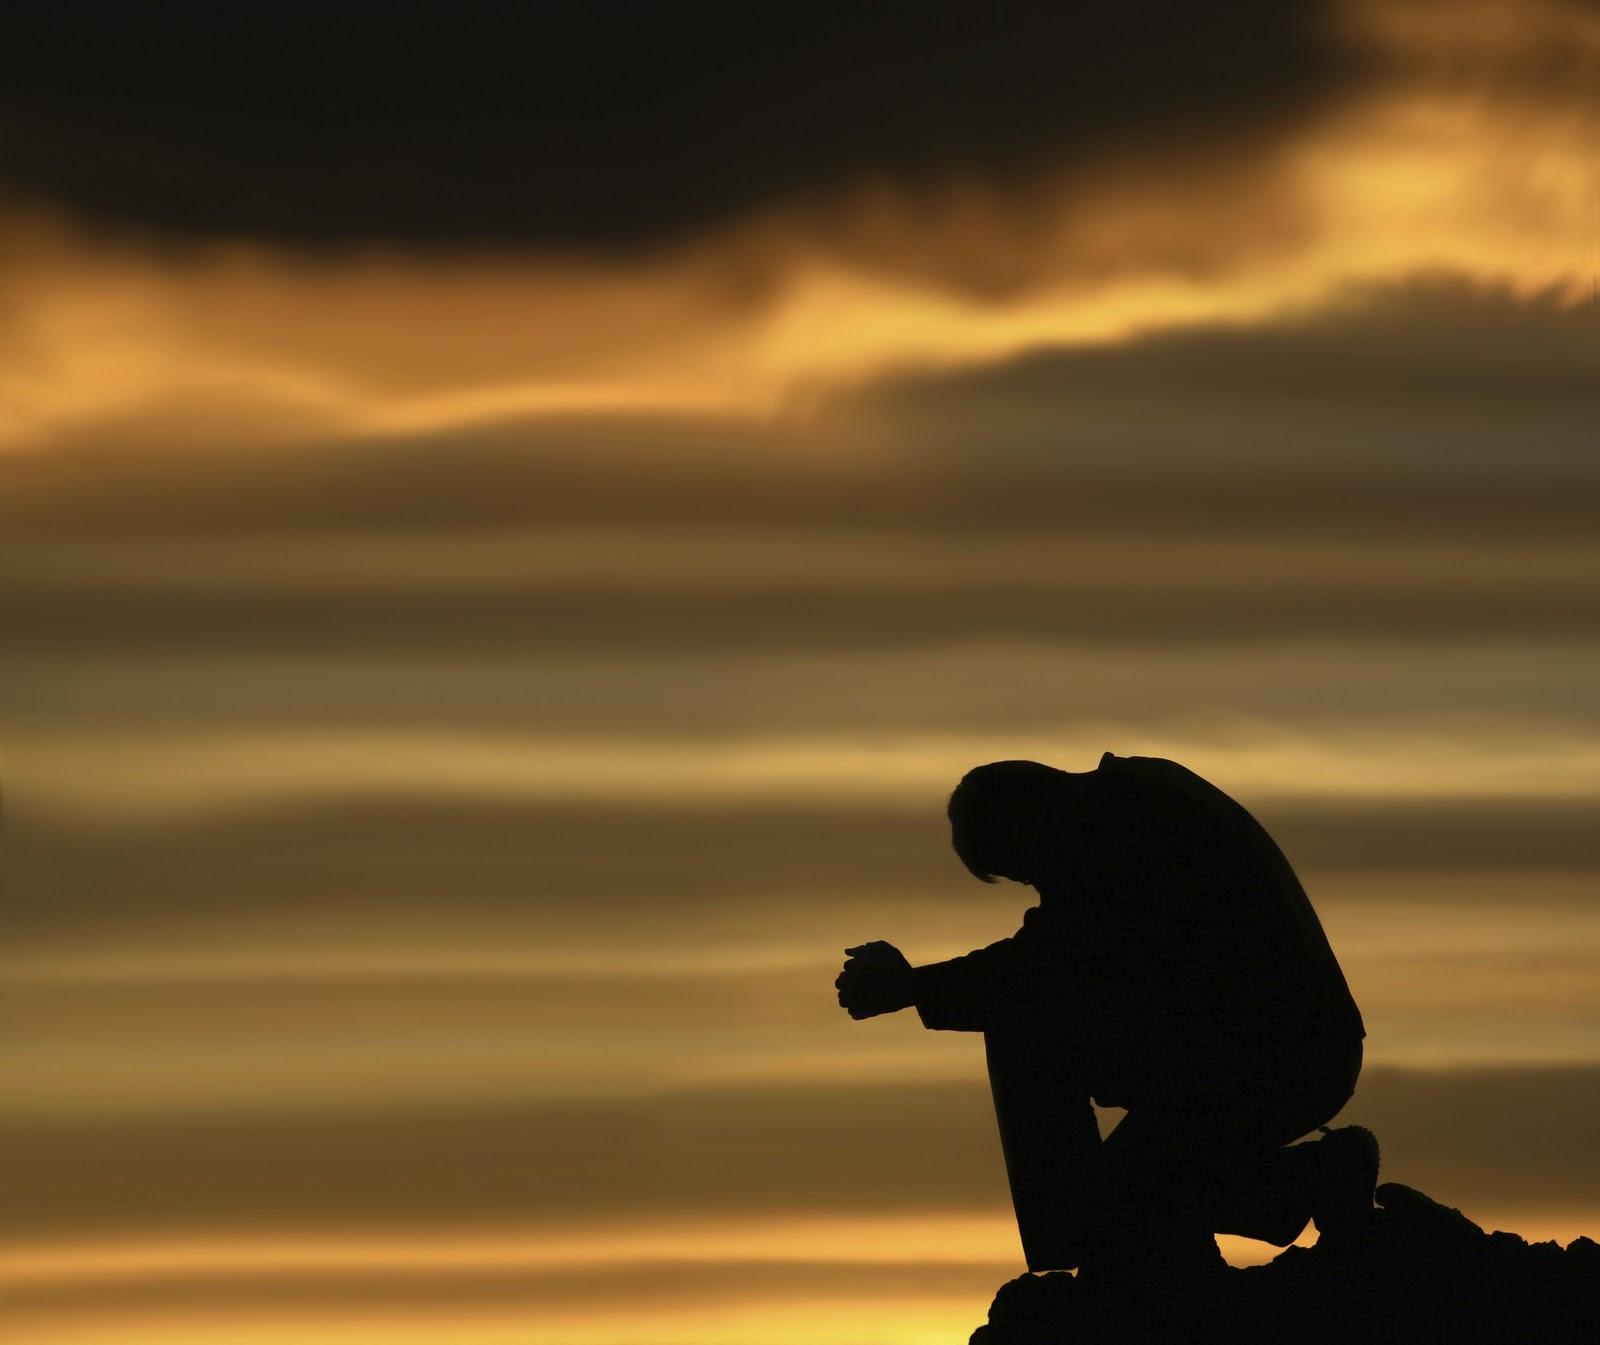 http://3.bp.blogspot.com/-S6wGmRjG3BE/UABusi-R4WI/AAAAAAAAFeo/6-WVjT93Fbk/s1600/alone+love+lonely+sad+emotional+missing+u+miss+girls+boys+wallpapers+(3).jpg